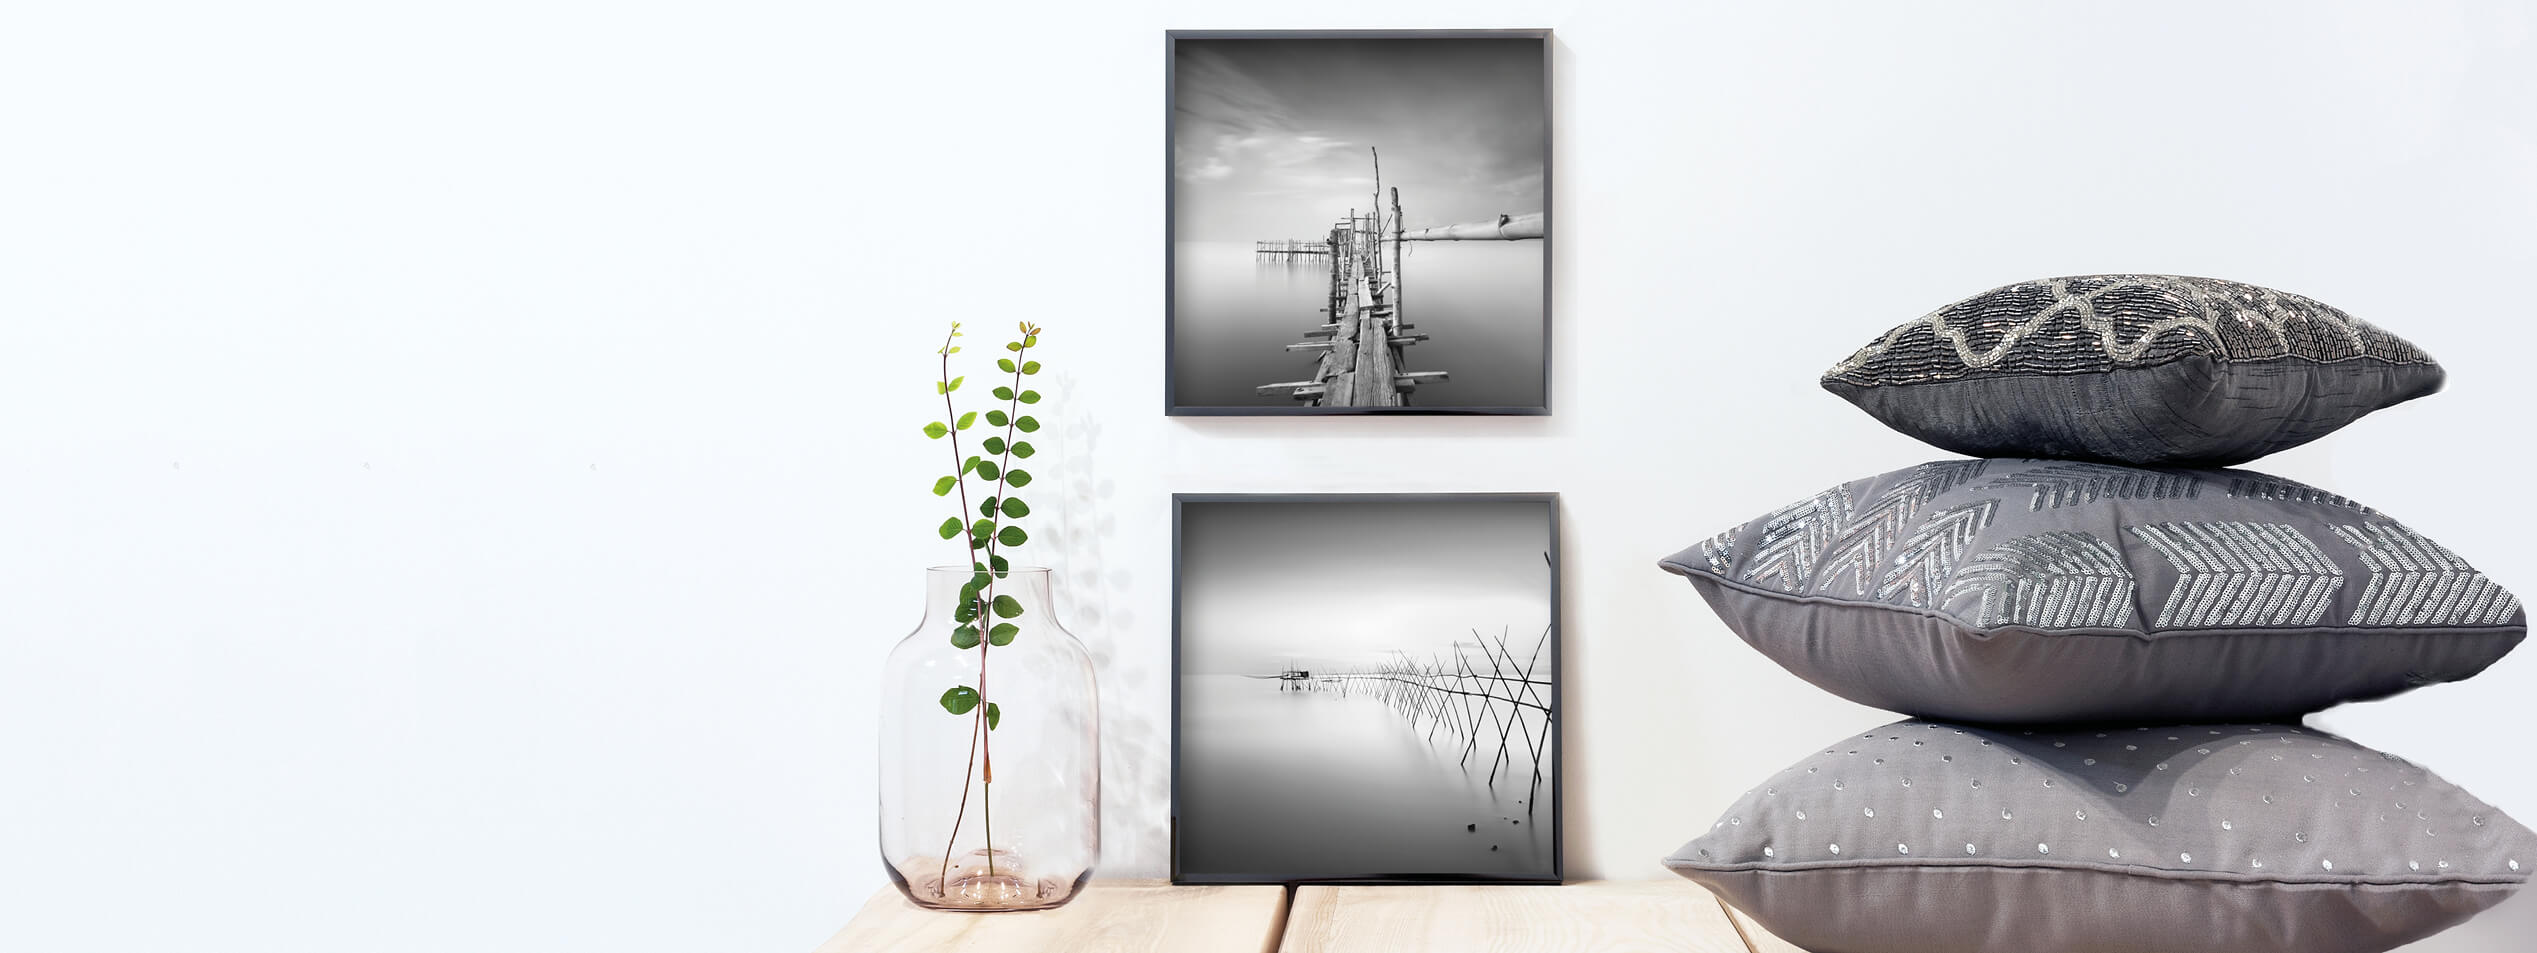 gro artig nielsen metallrahmen bilder benutzerdefinierte bilderrahmen ideen. Black Bedroom Furniture Sets. Home Design Ideas